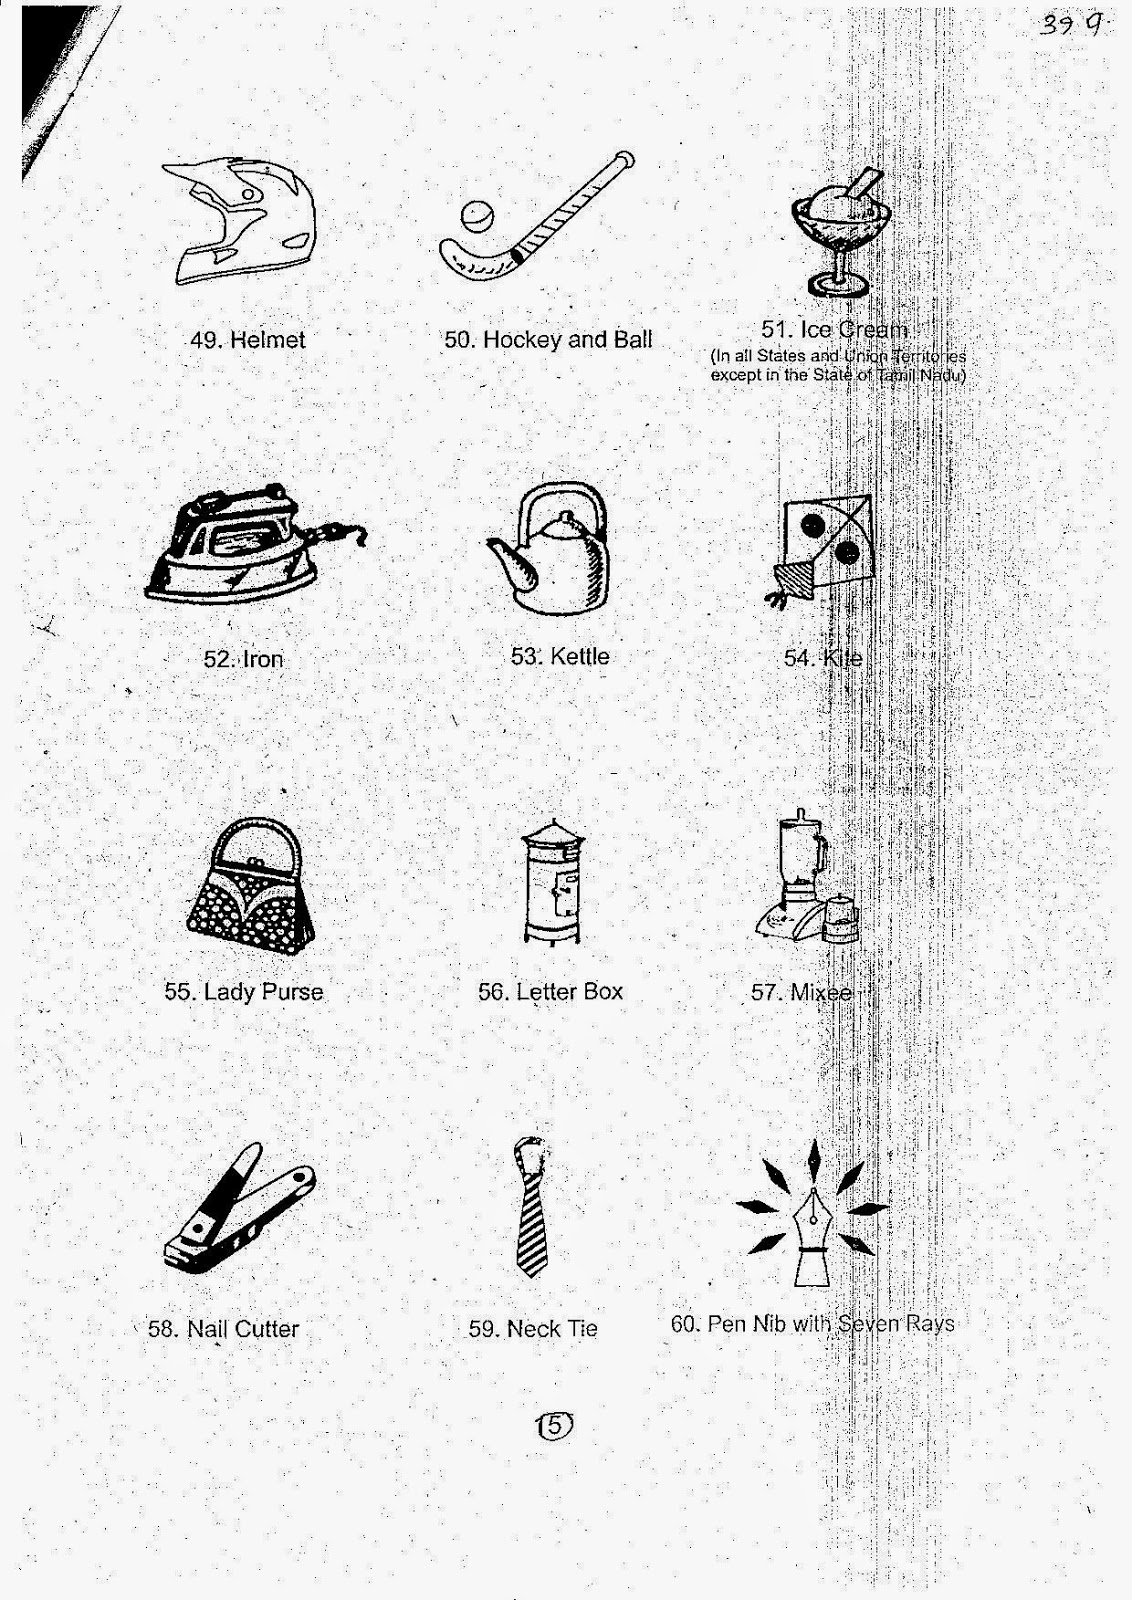 Housing Society [Maharashtra]: Circular for Election Symbols